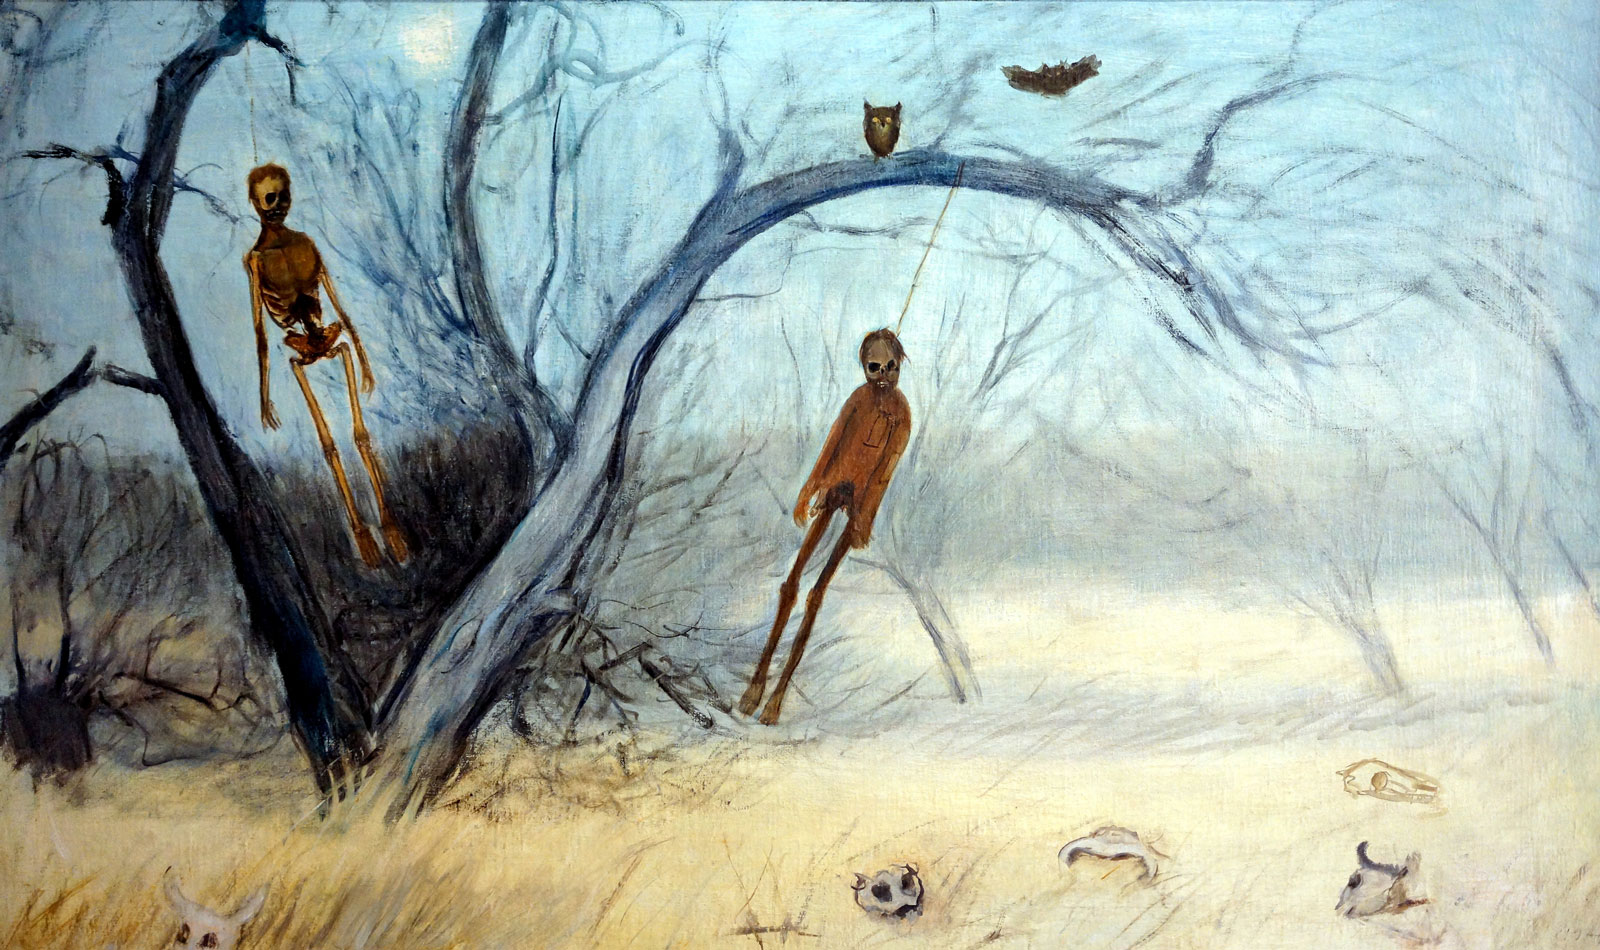 Francisco Goitia: Zacatecas Landscape with Hanged Men I, circa 1914